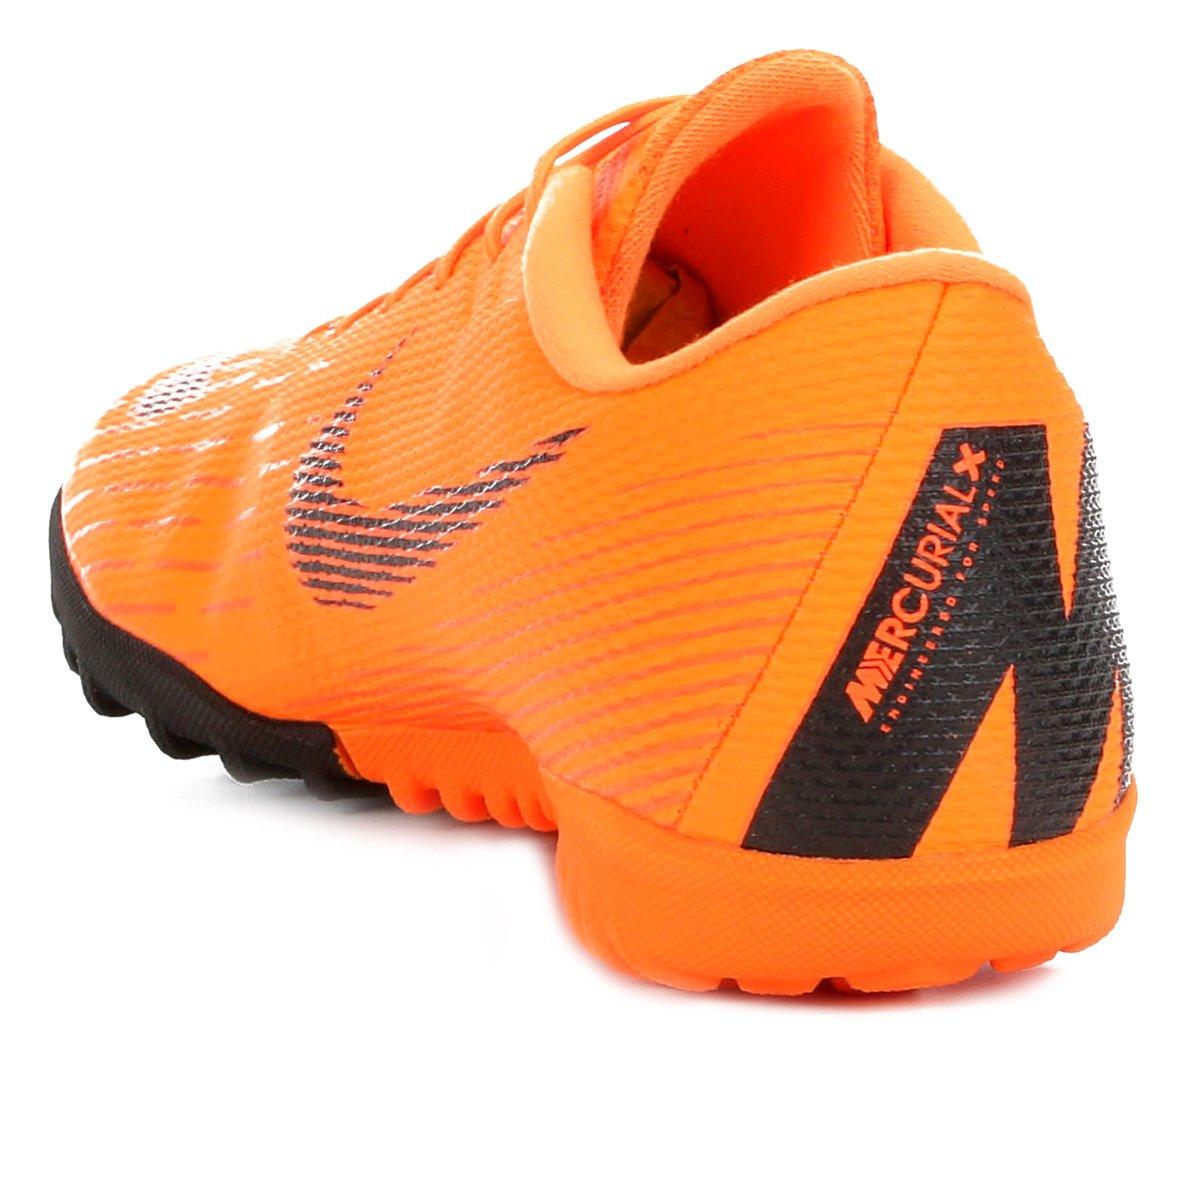 Laranja e Masculina 12 Nike Preto Vapor Mercurial Academy Society Chuteira q1wB0f1